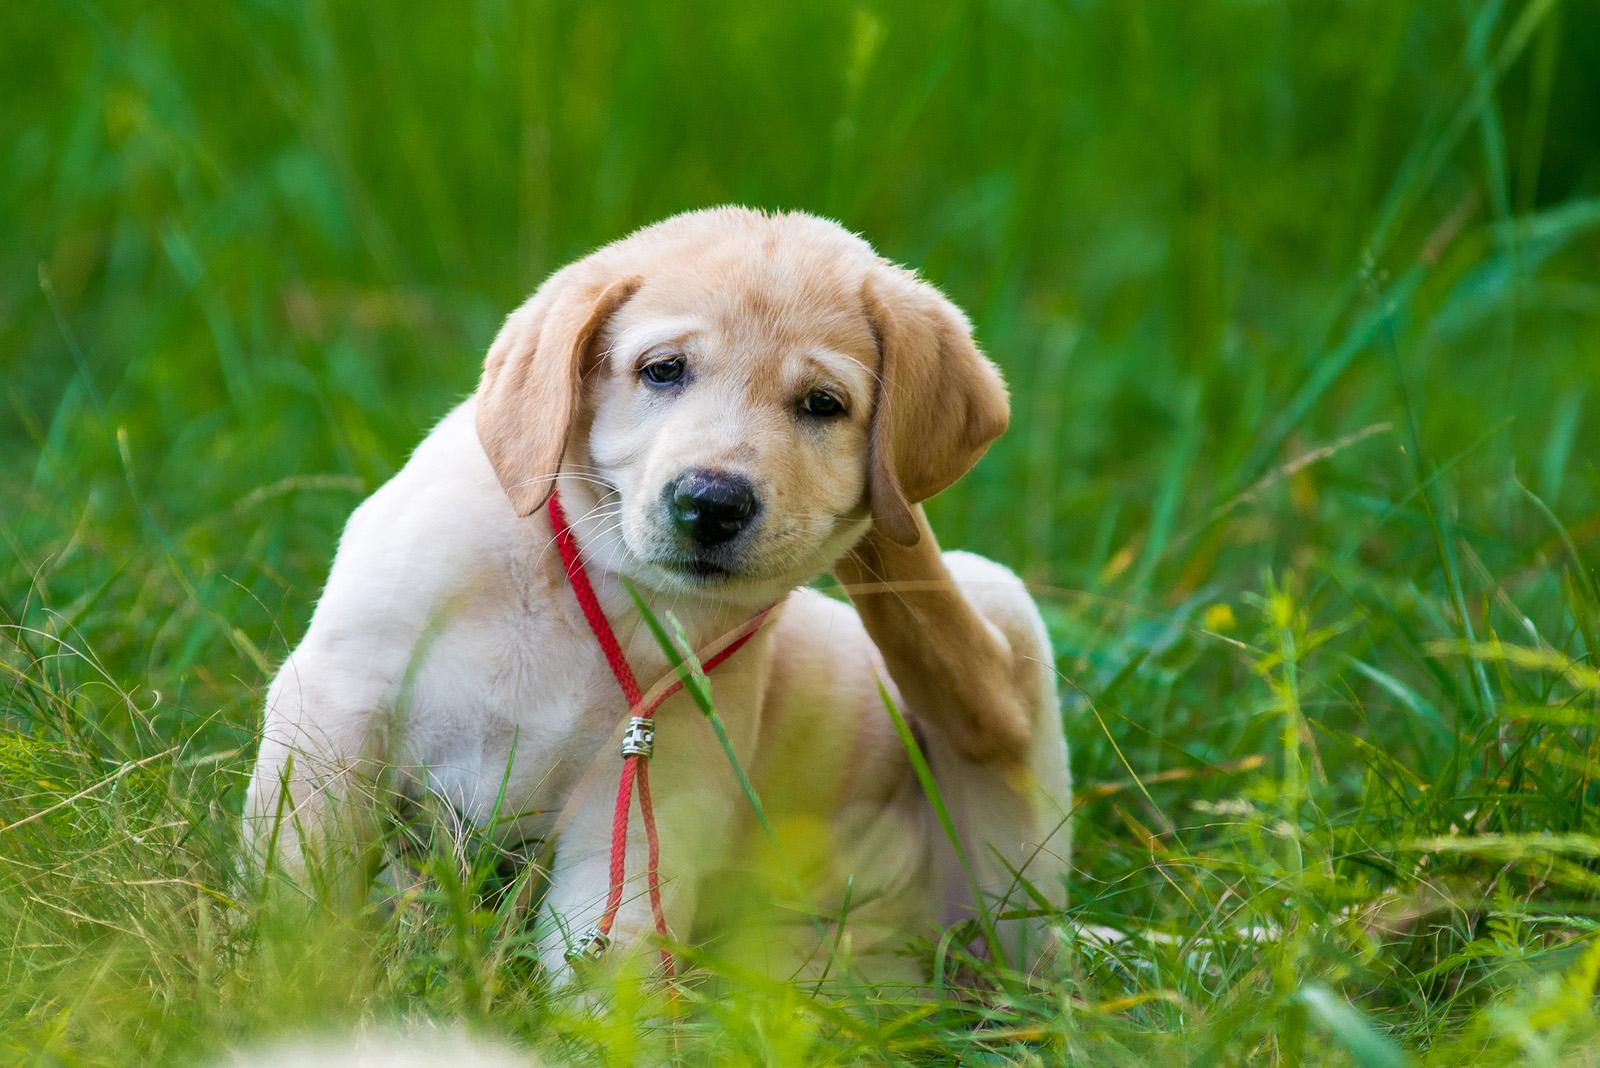 Port-Orchard-Animal-Clinic_Dr-Liz-Oien-DVM_Veterinarian_pet-care-fleas.jpg